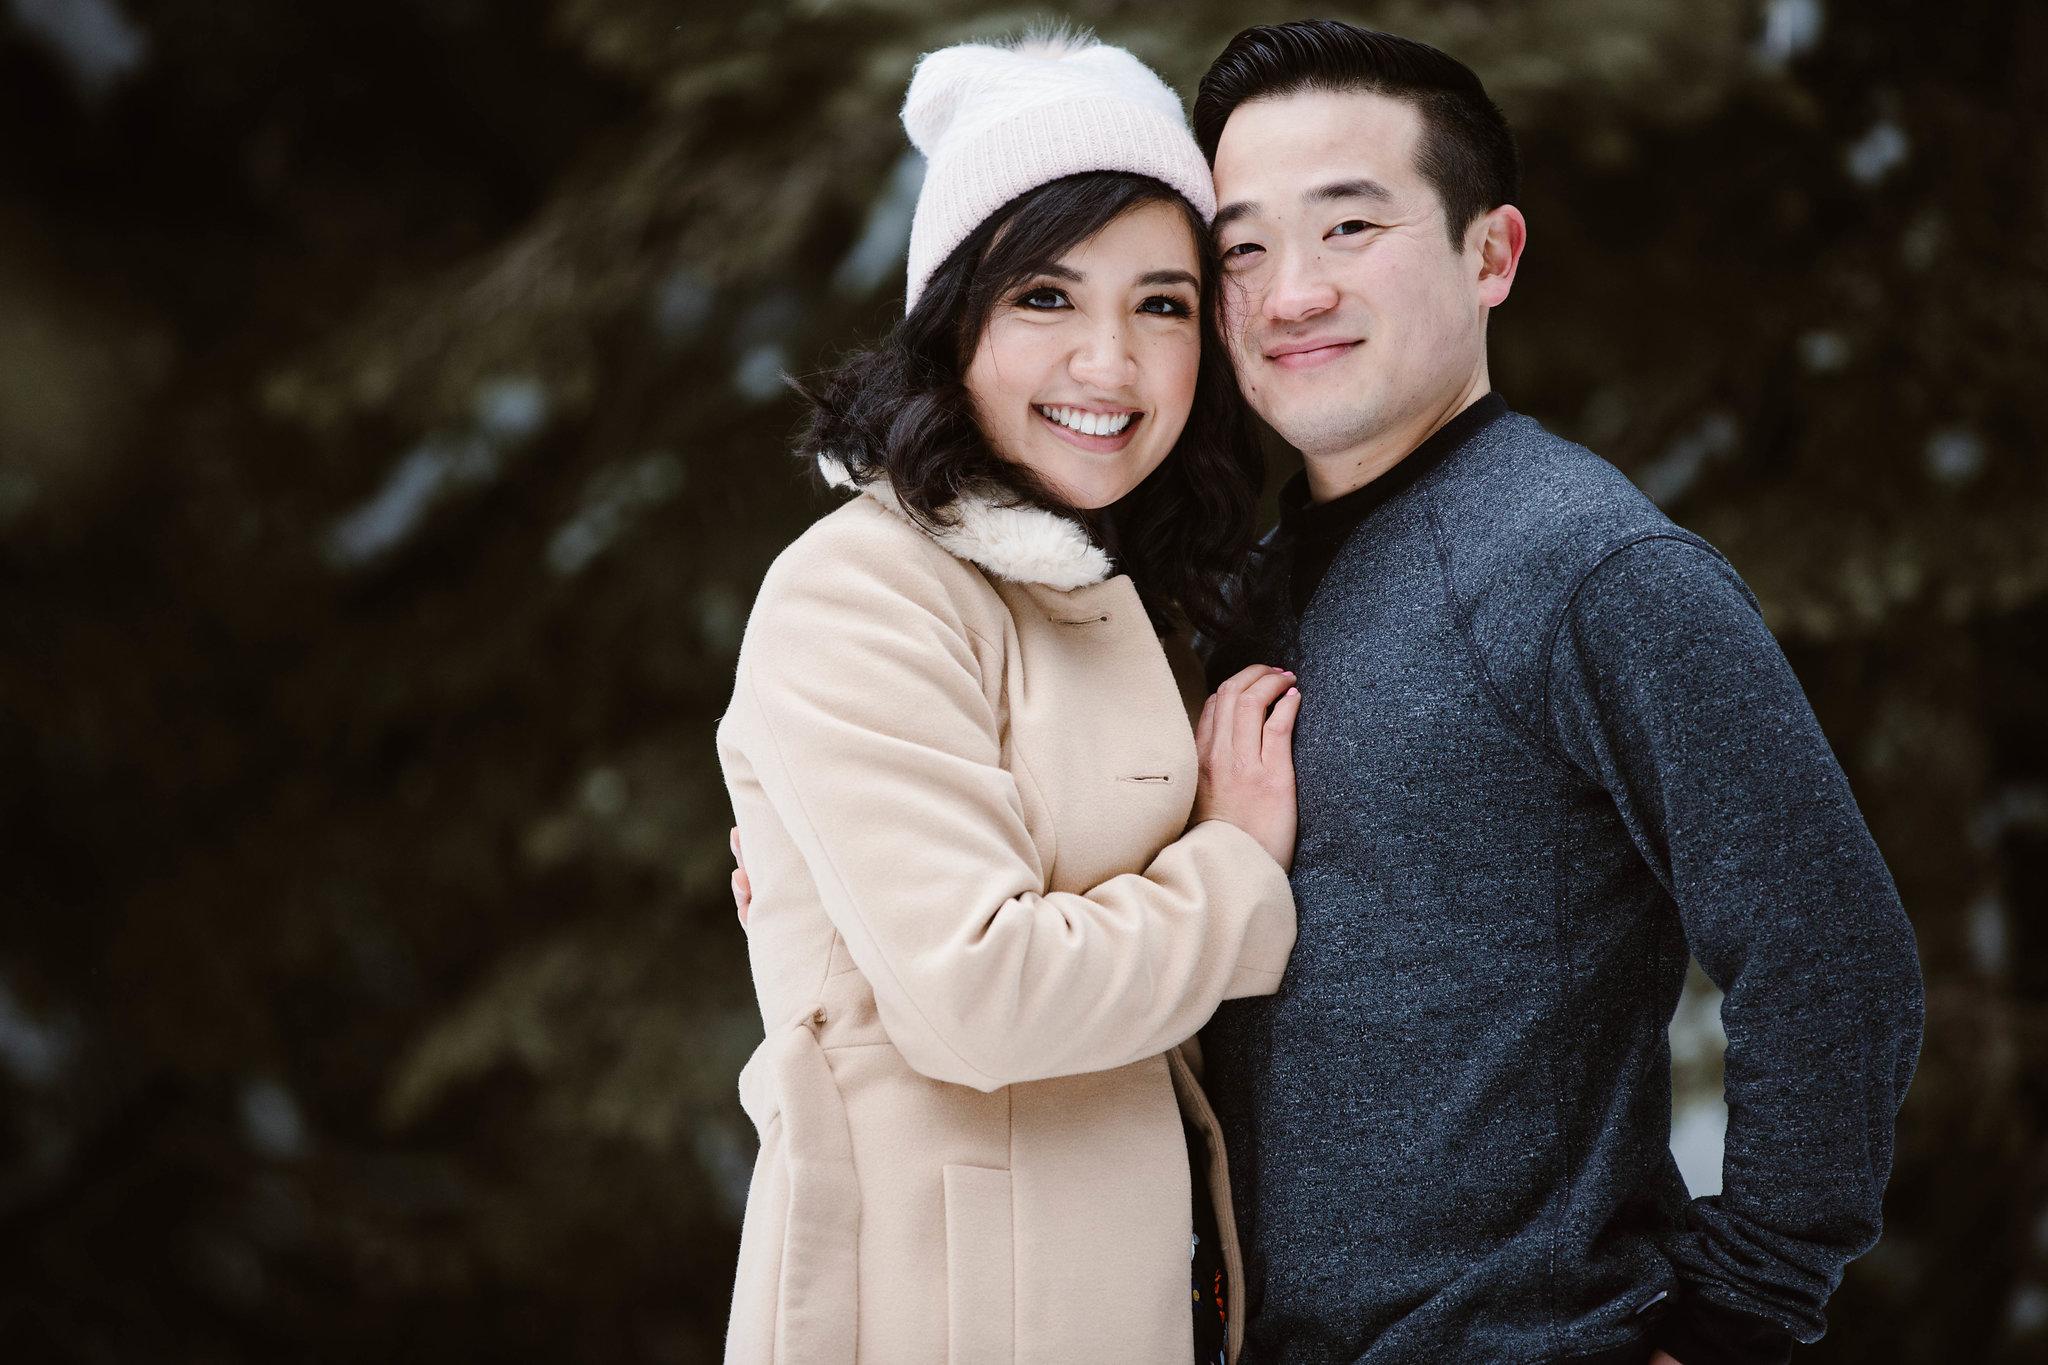 Sarah+Sean_Engagement_Golden+Creek+Pond_Best+Seattle+Wedding+Photographer38.JPG